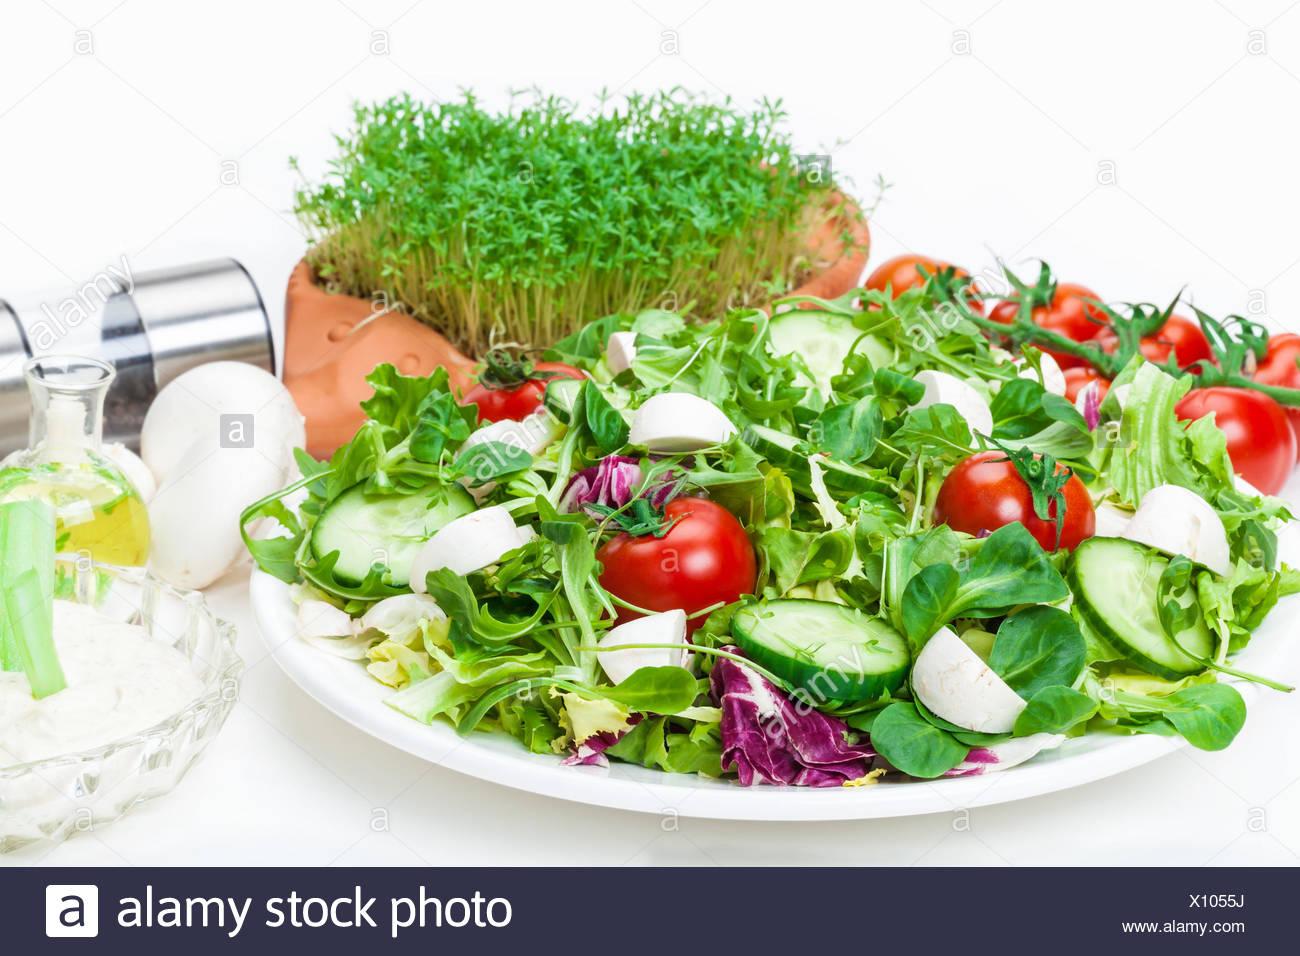 Salad plate - Stock Image